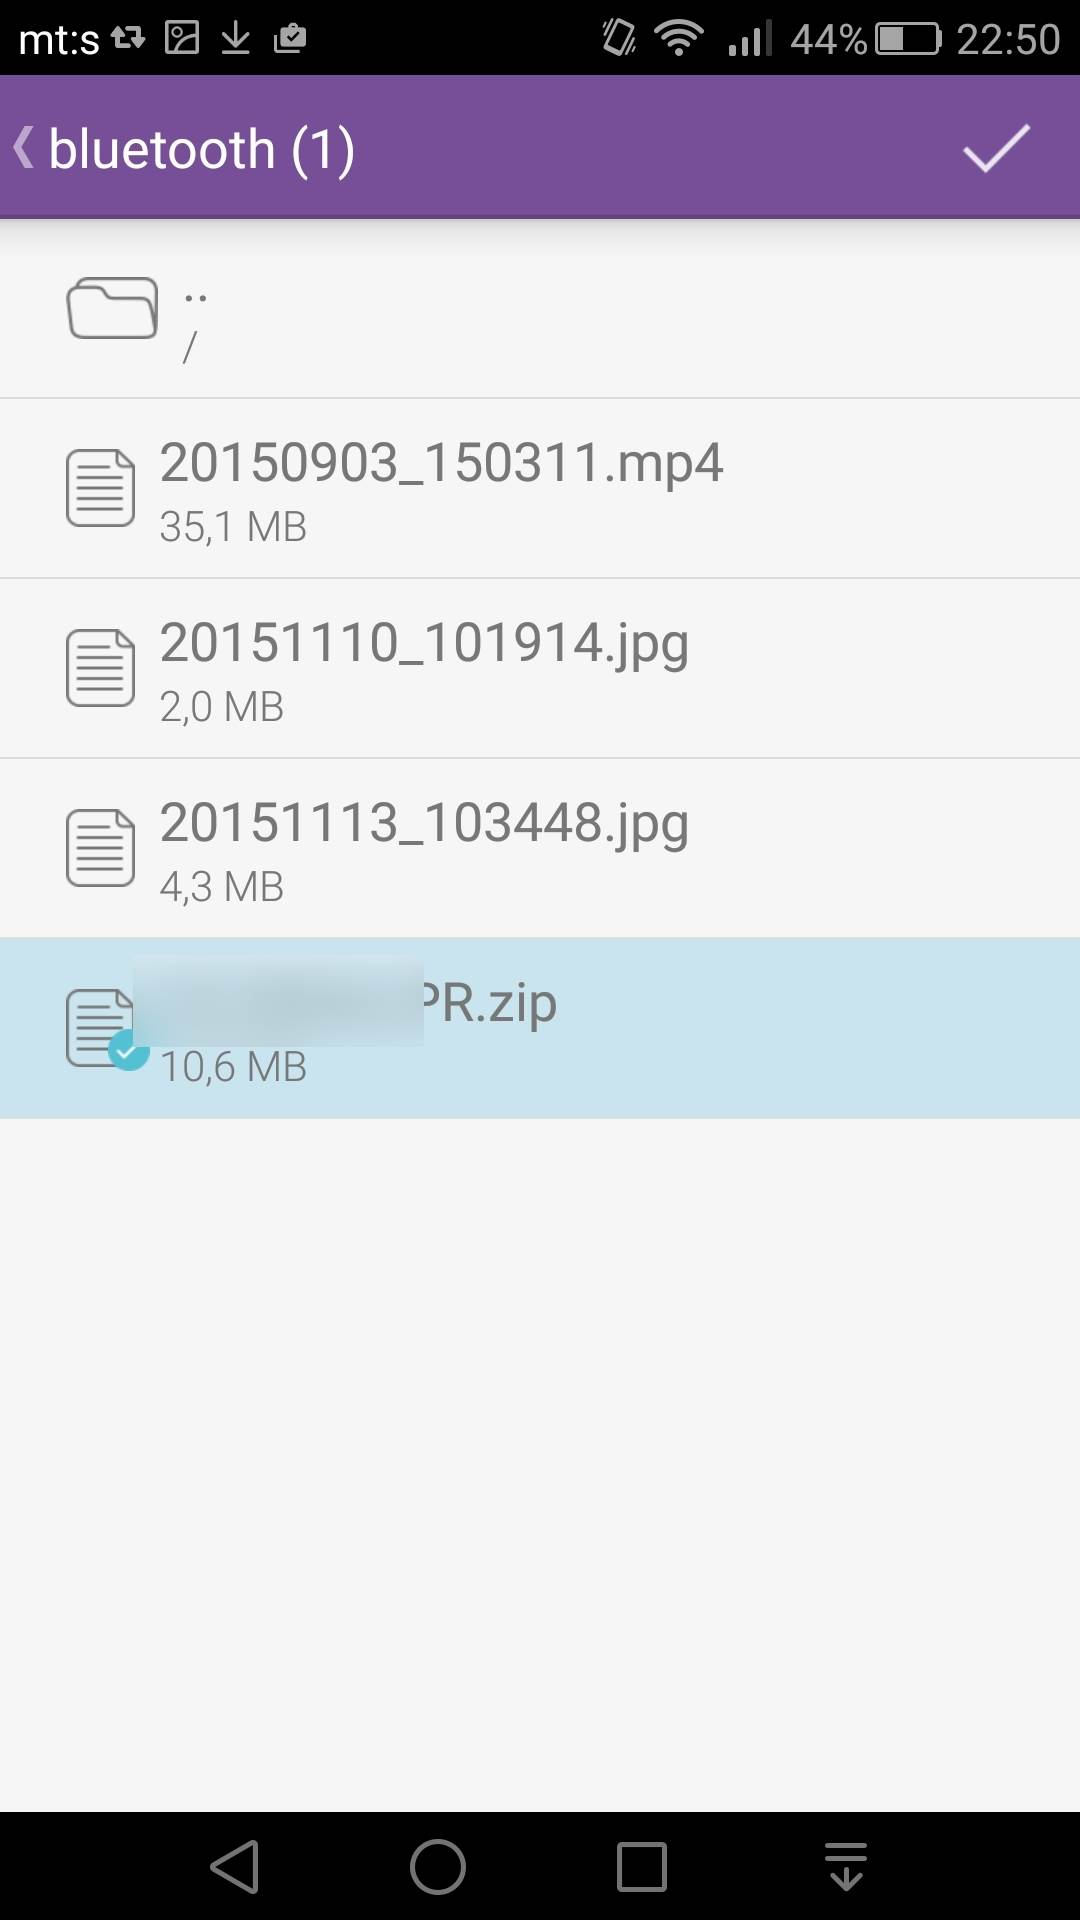 Viber trik olakšava razmenu fajlova